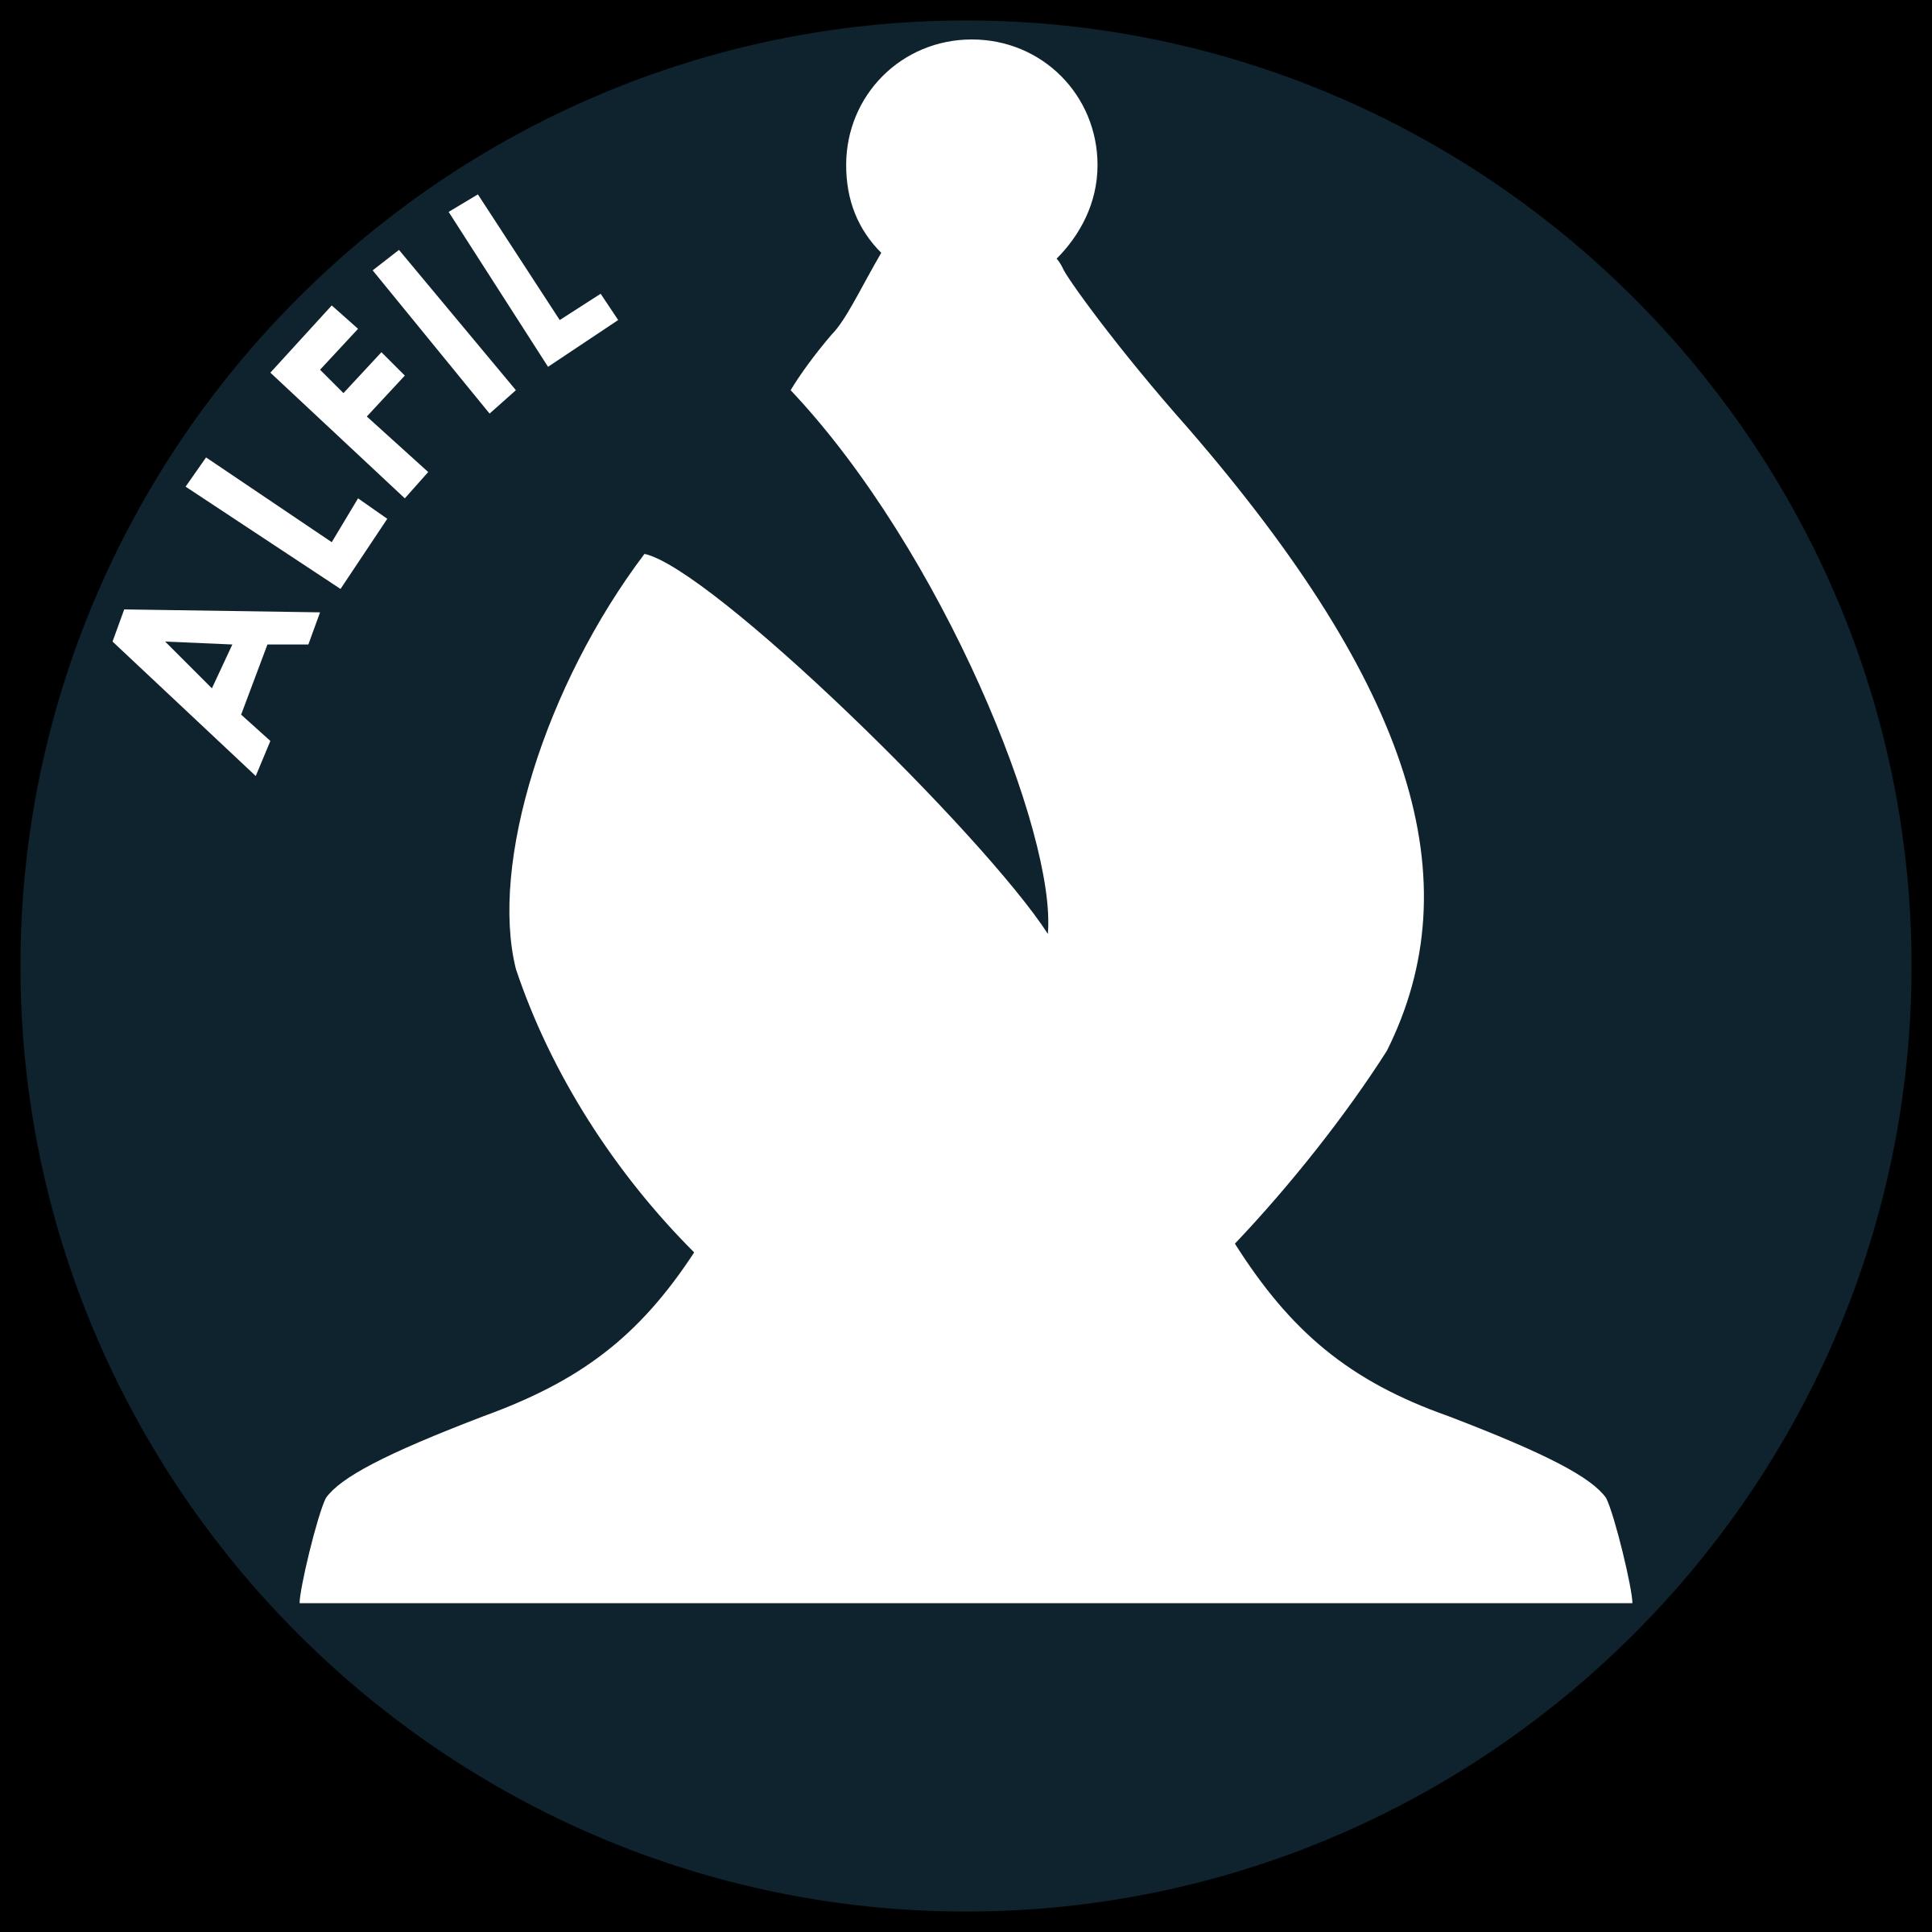 clipart pieza de ajedrez con nombre alfil blanco horse clip art for kids horse clip art borders